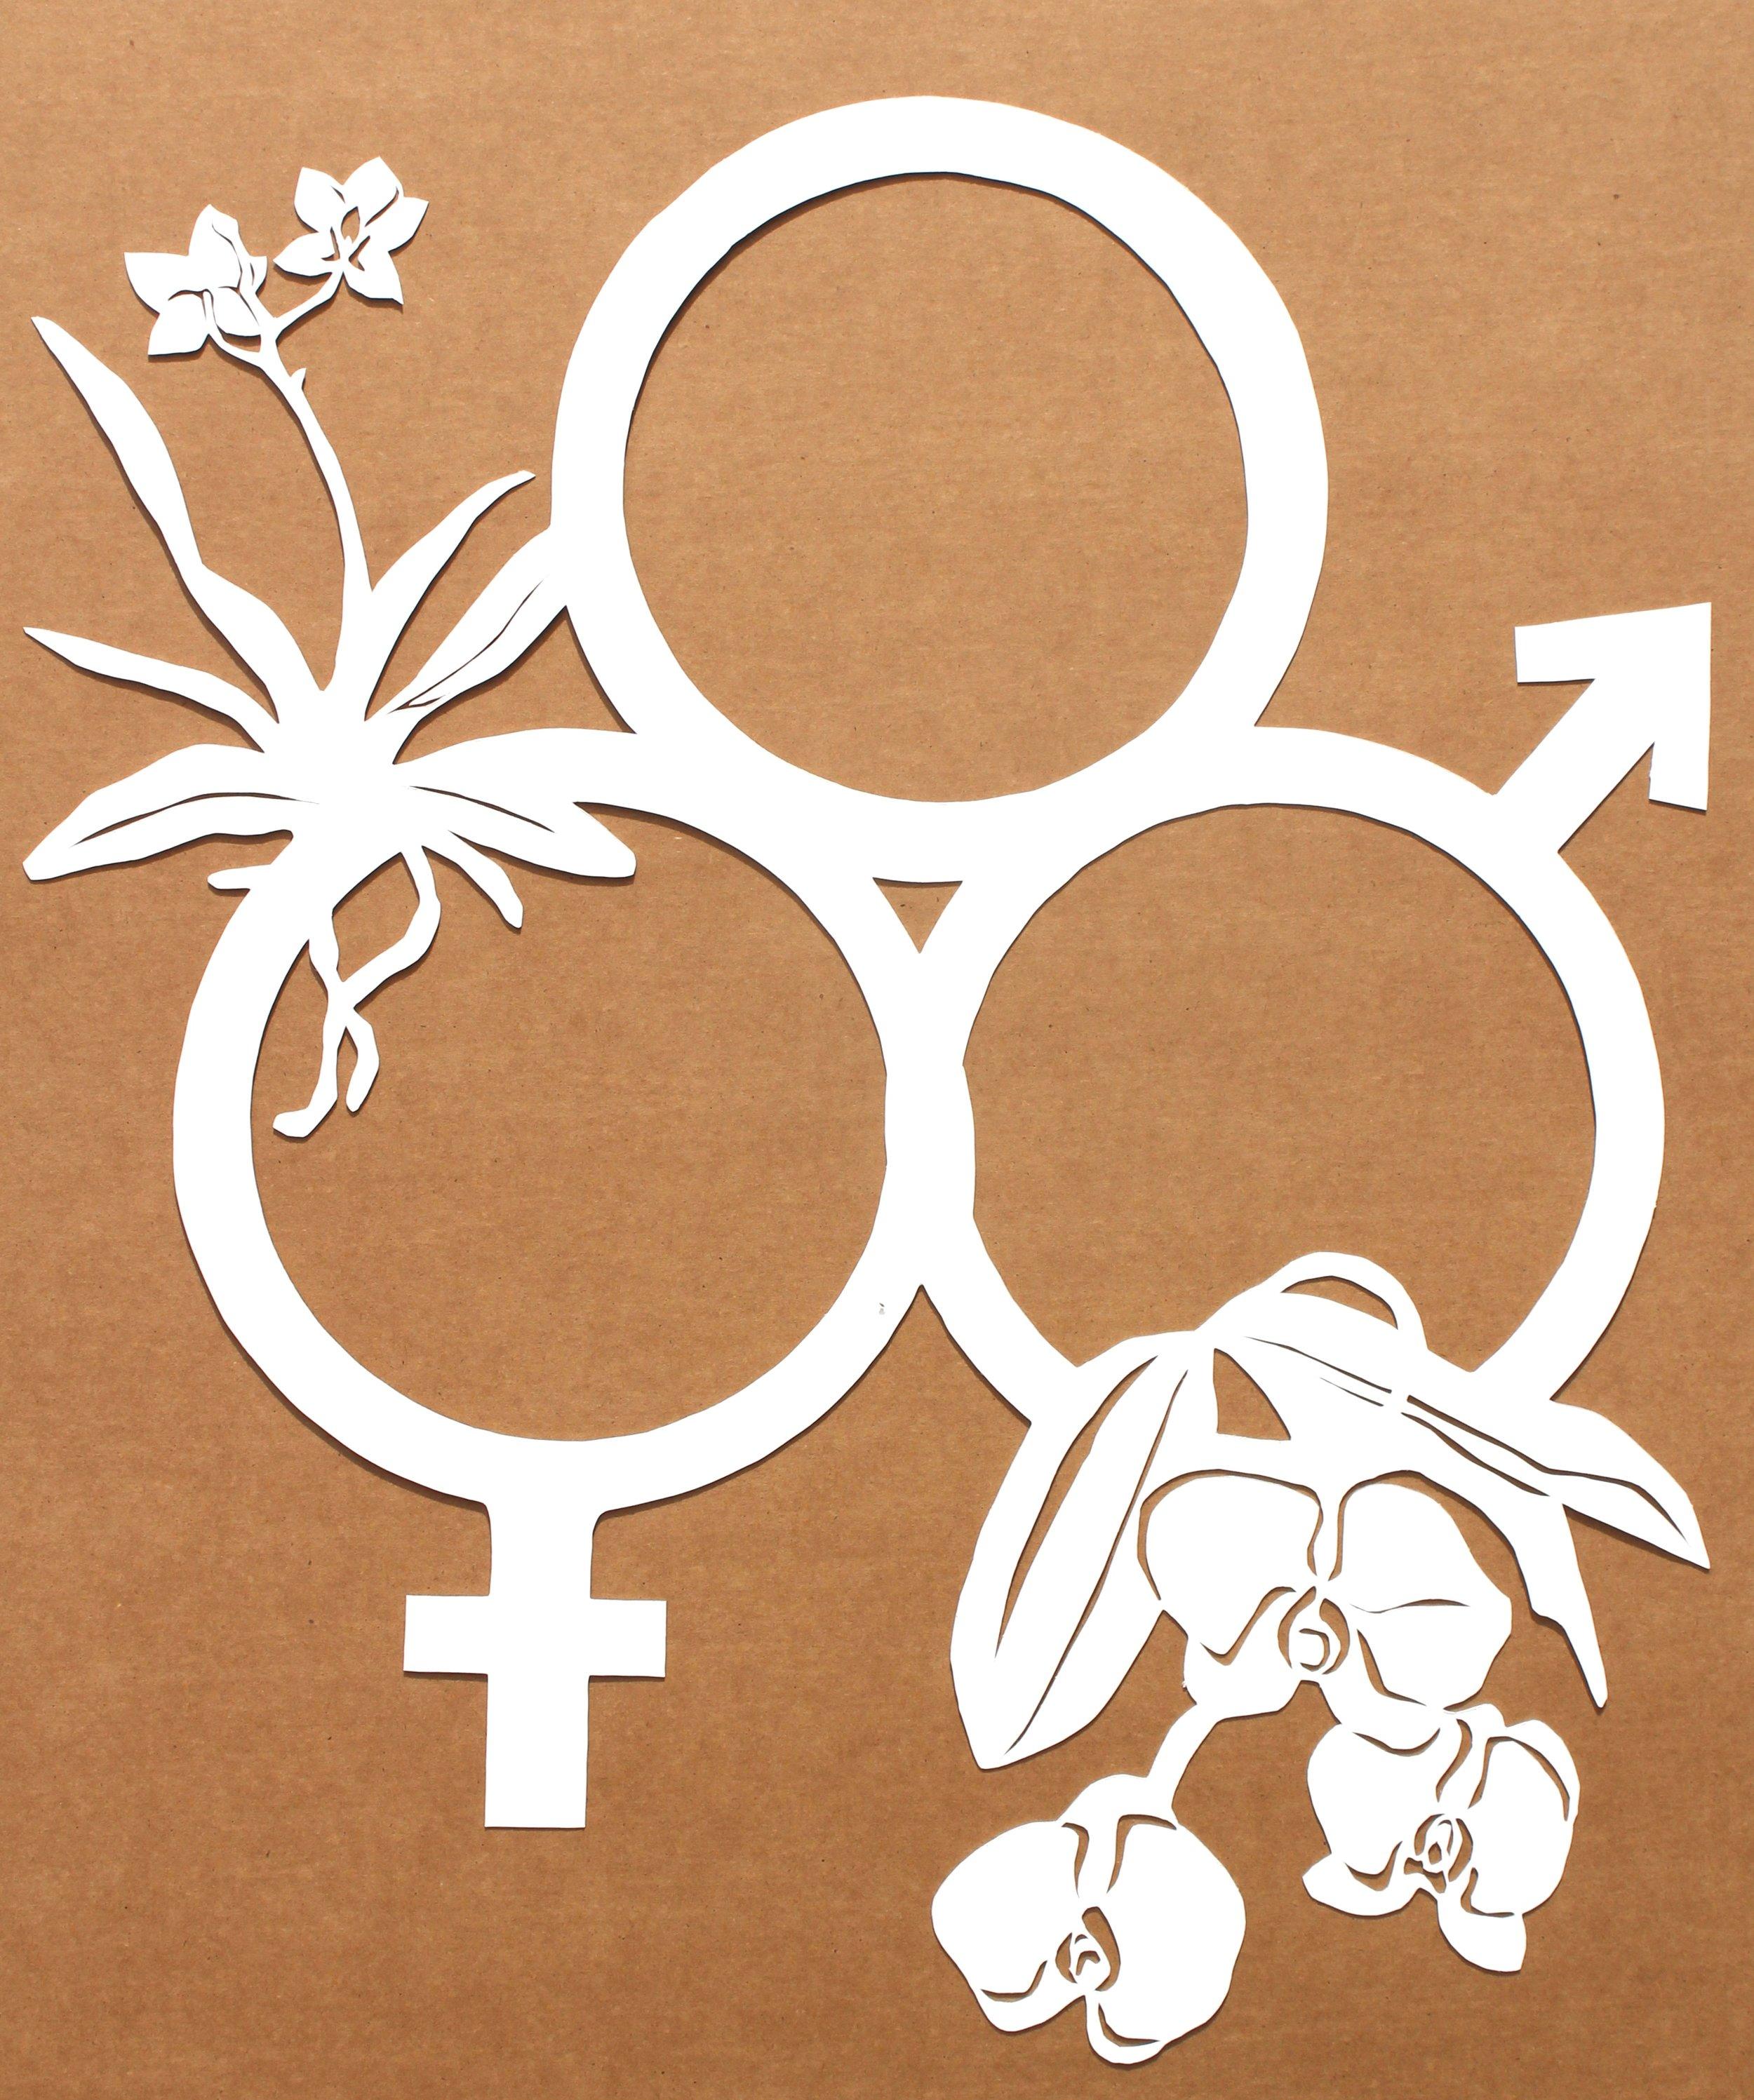 deco gender cut out.jpg final.jpg